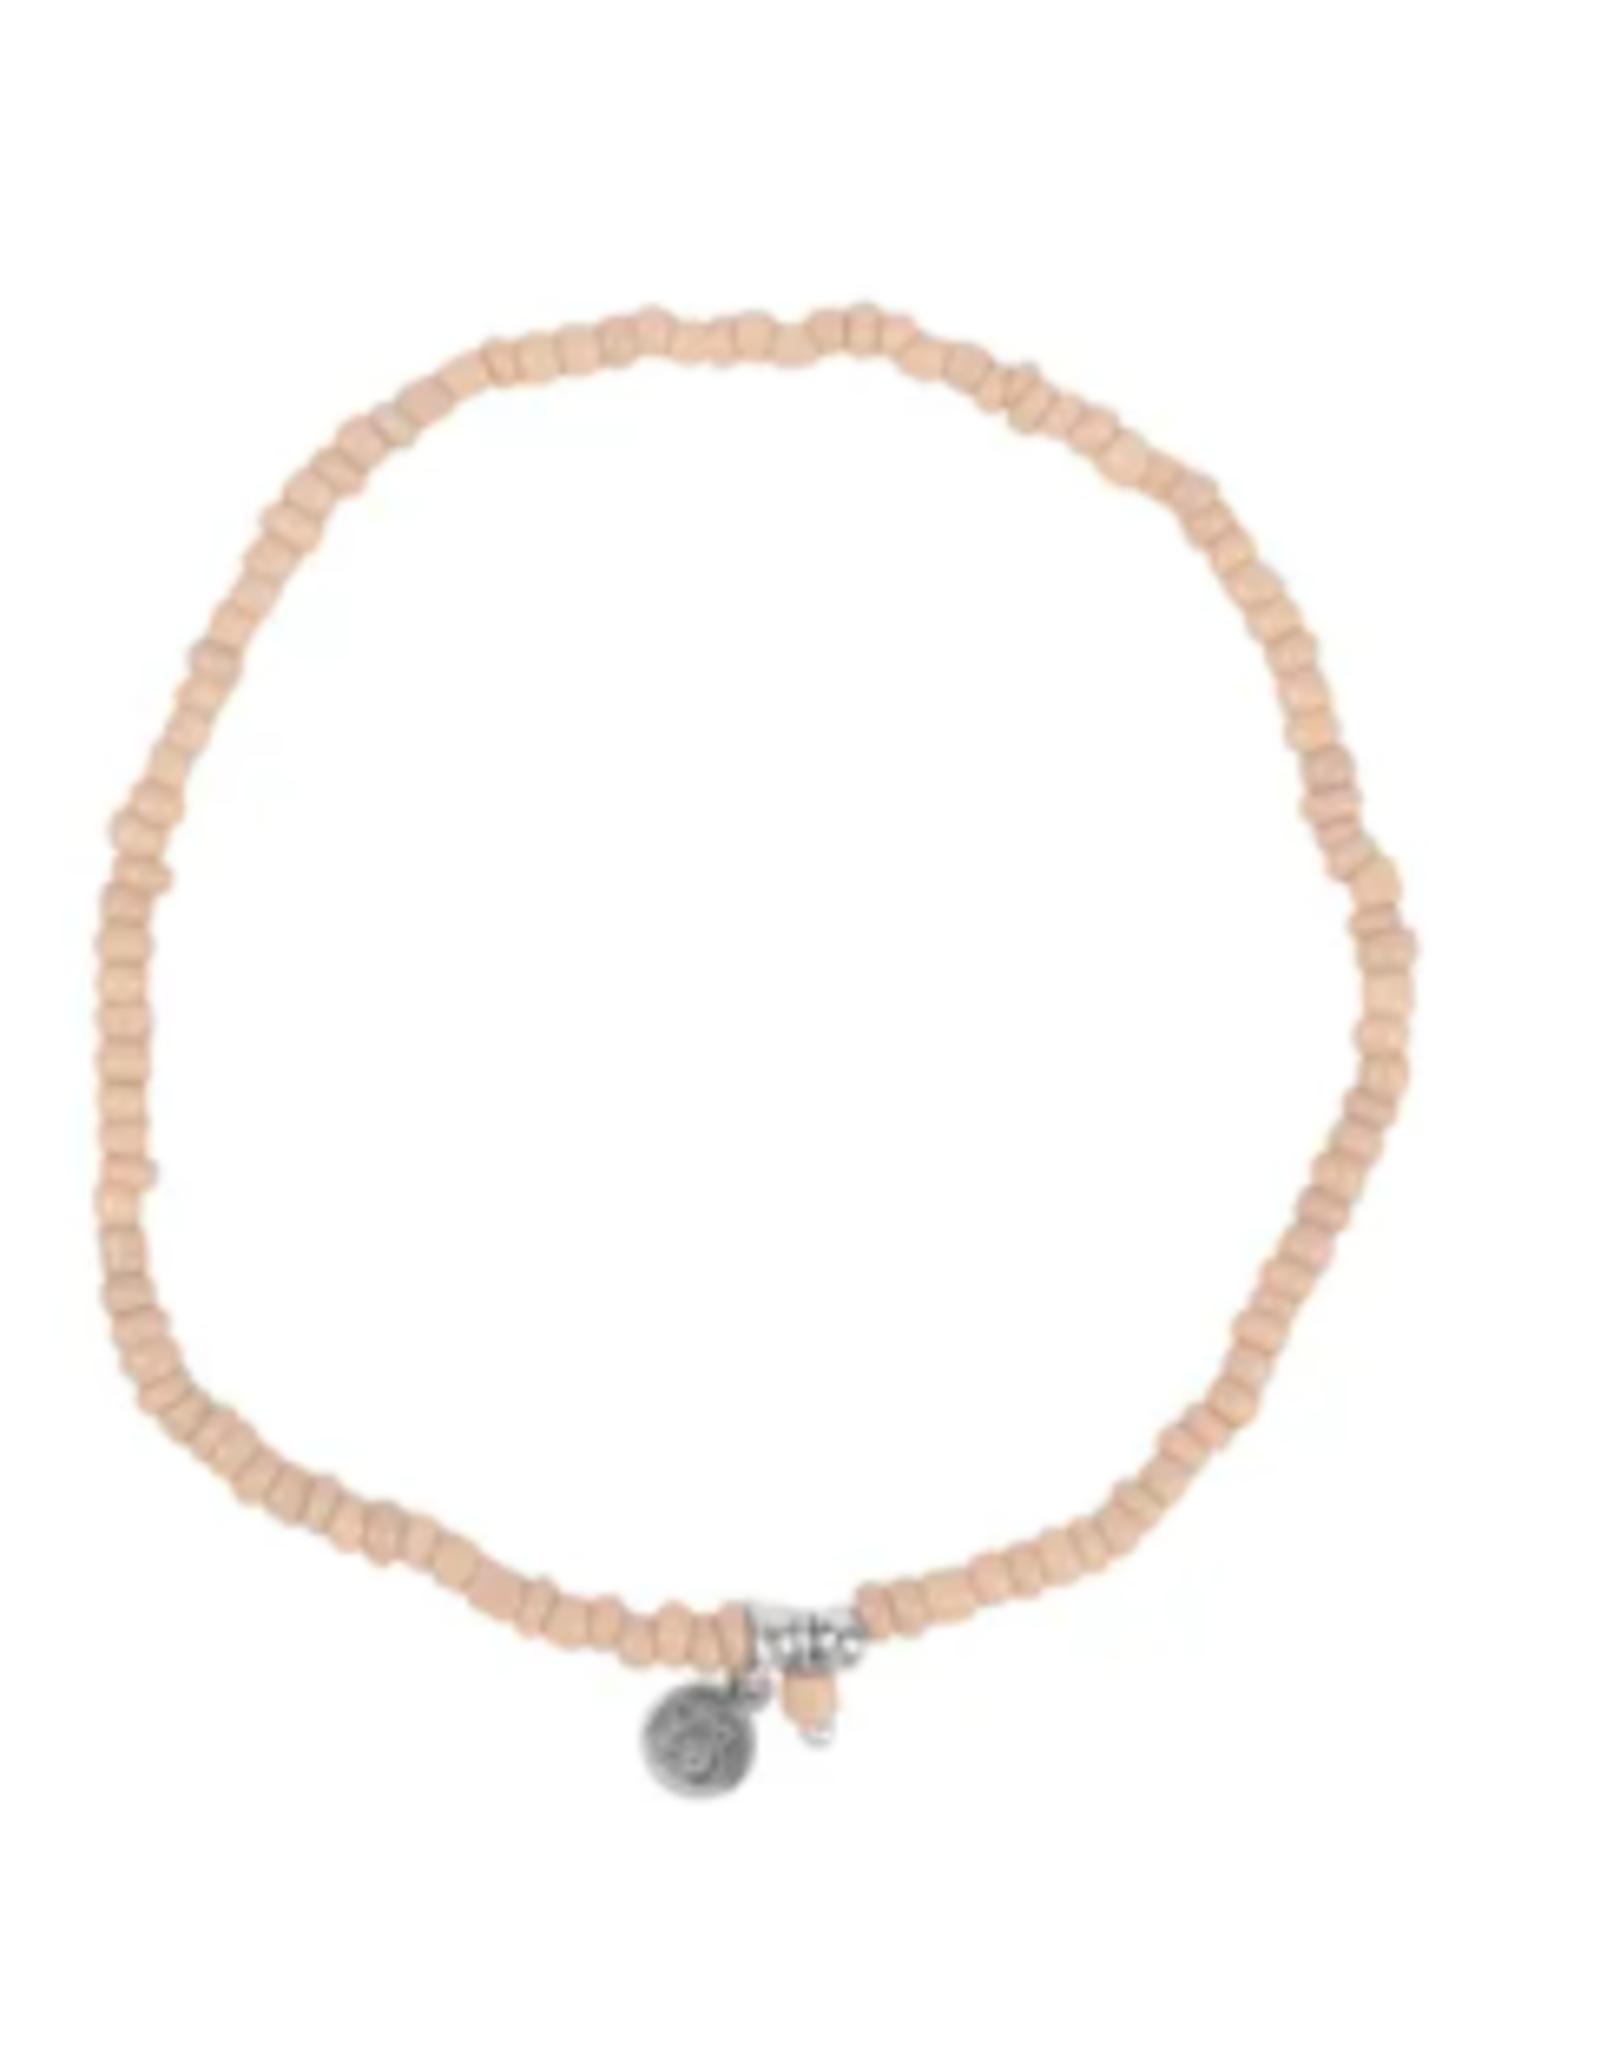 Zusss sss - Fijn kralenarmbandje zand/zilver